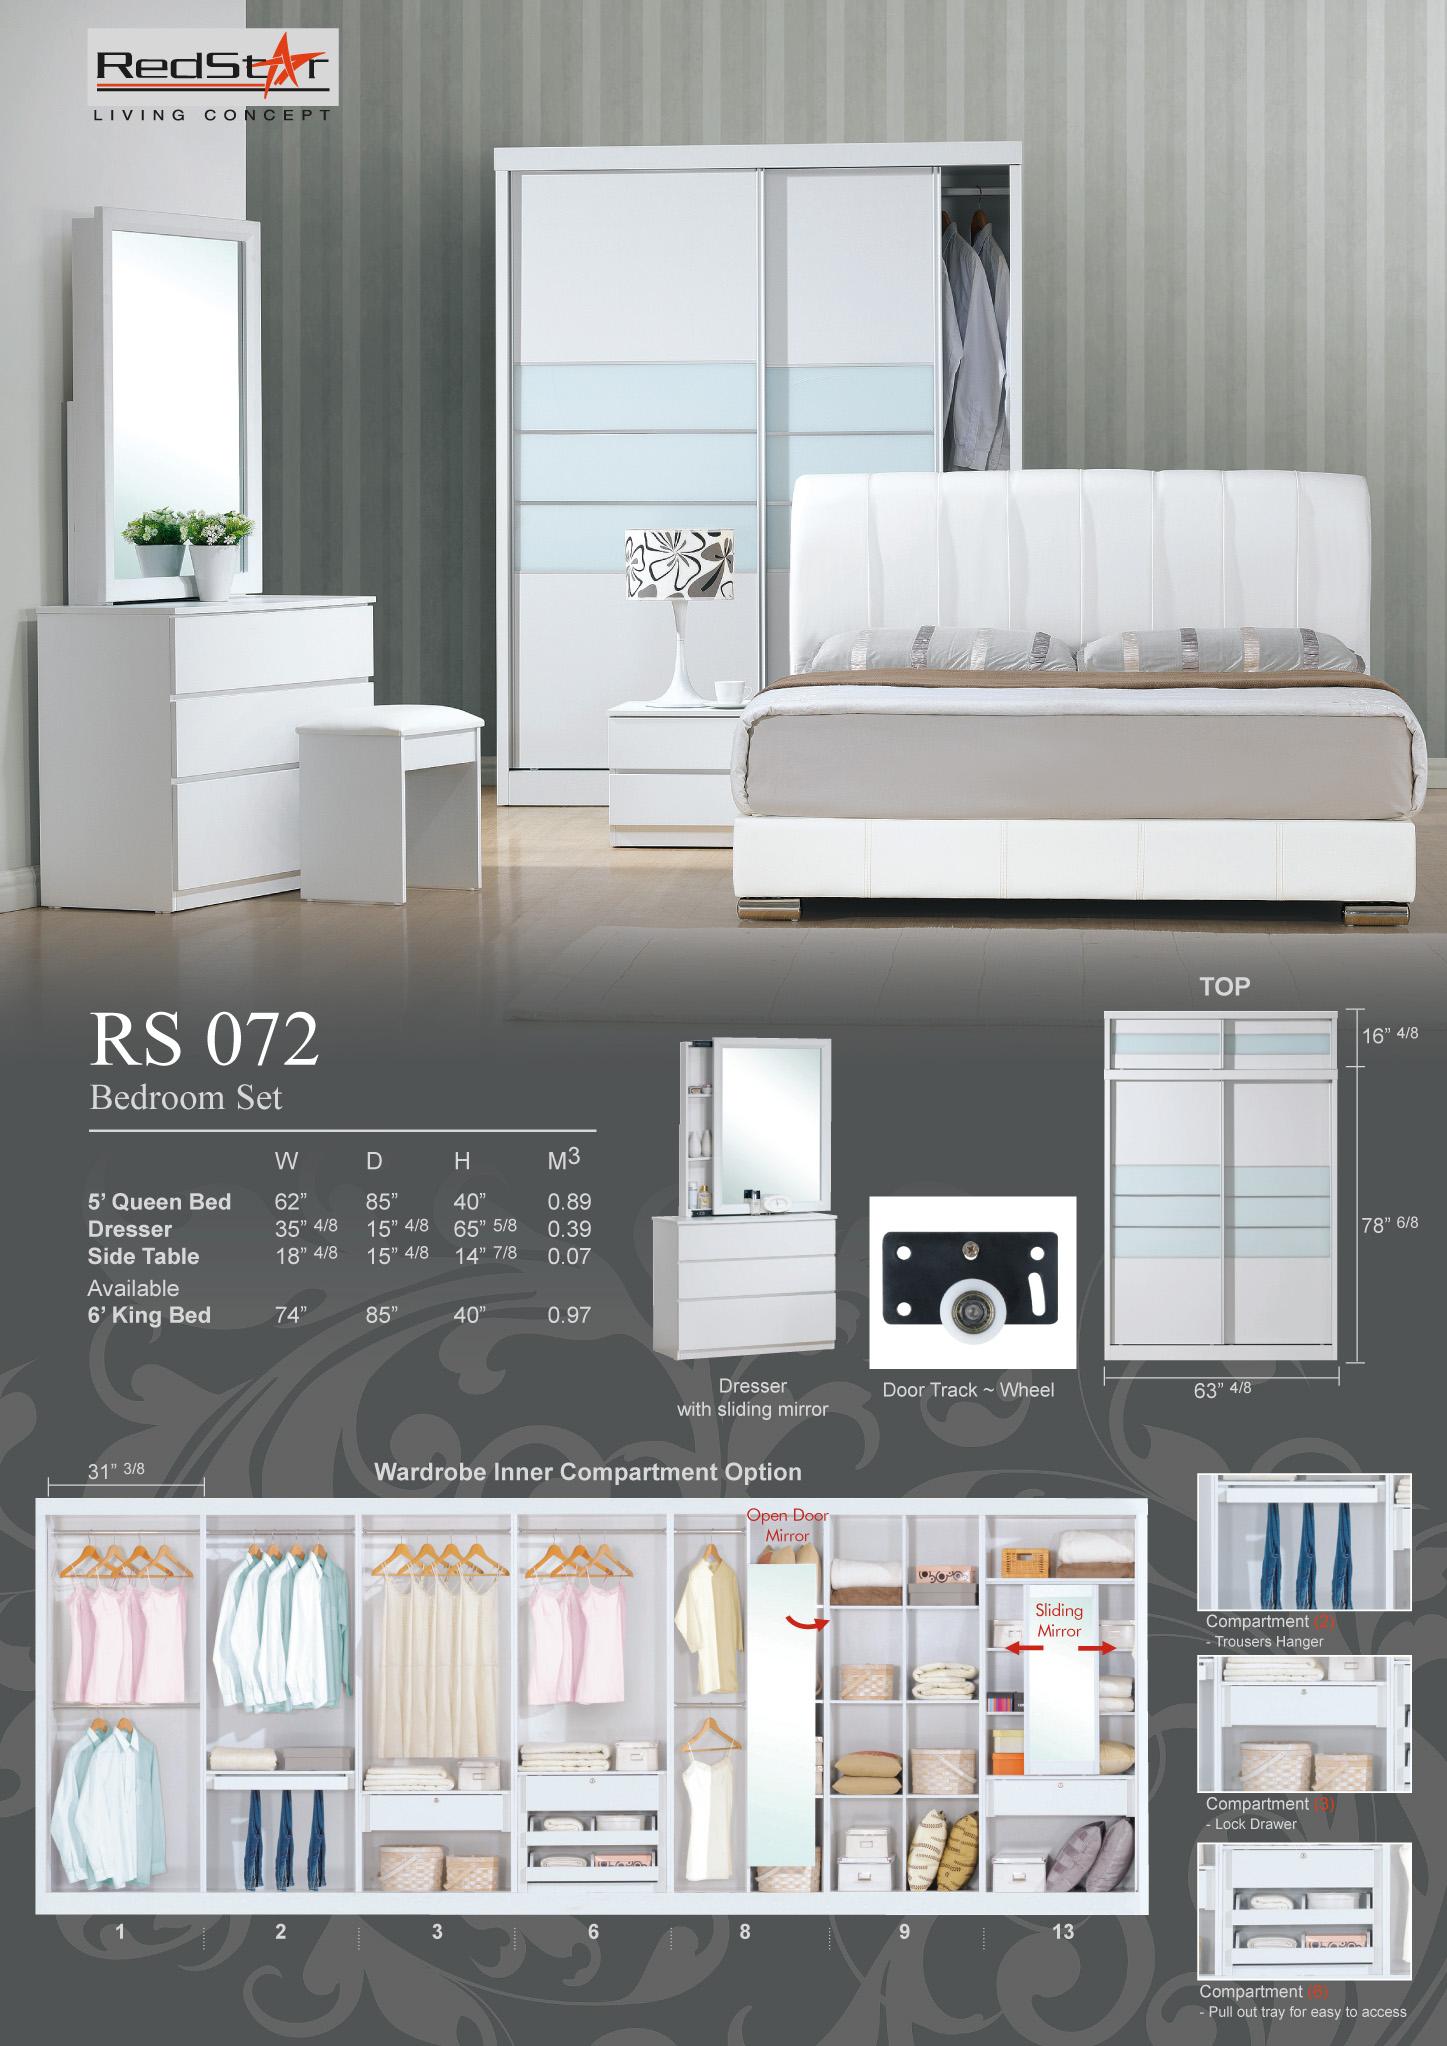 RS072